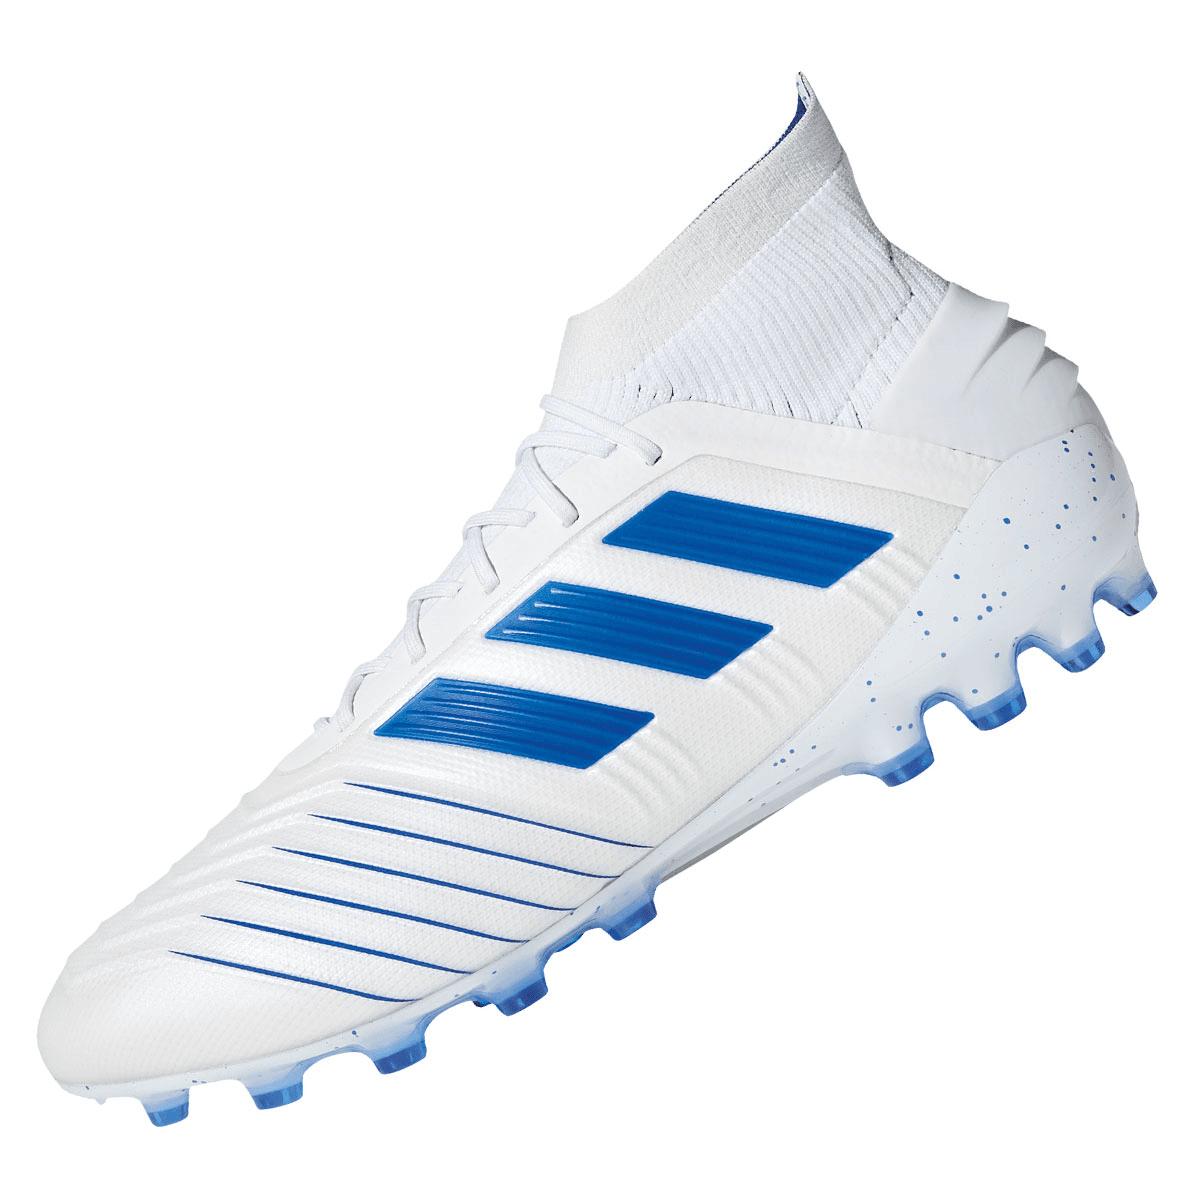 Adidas Fussballschuh Predator 19 1 Ag Weiss Blau